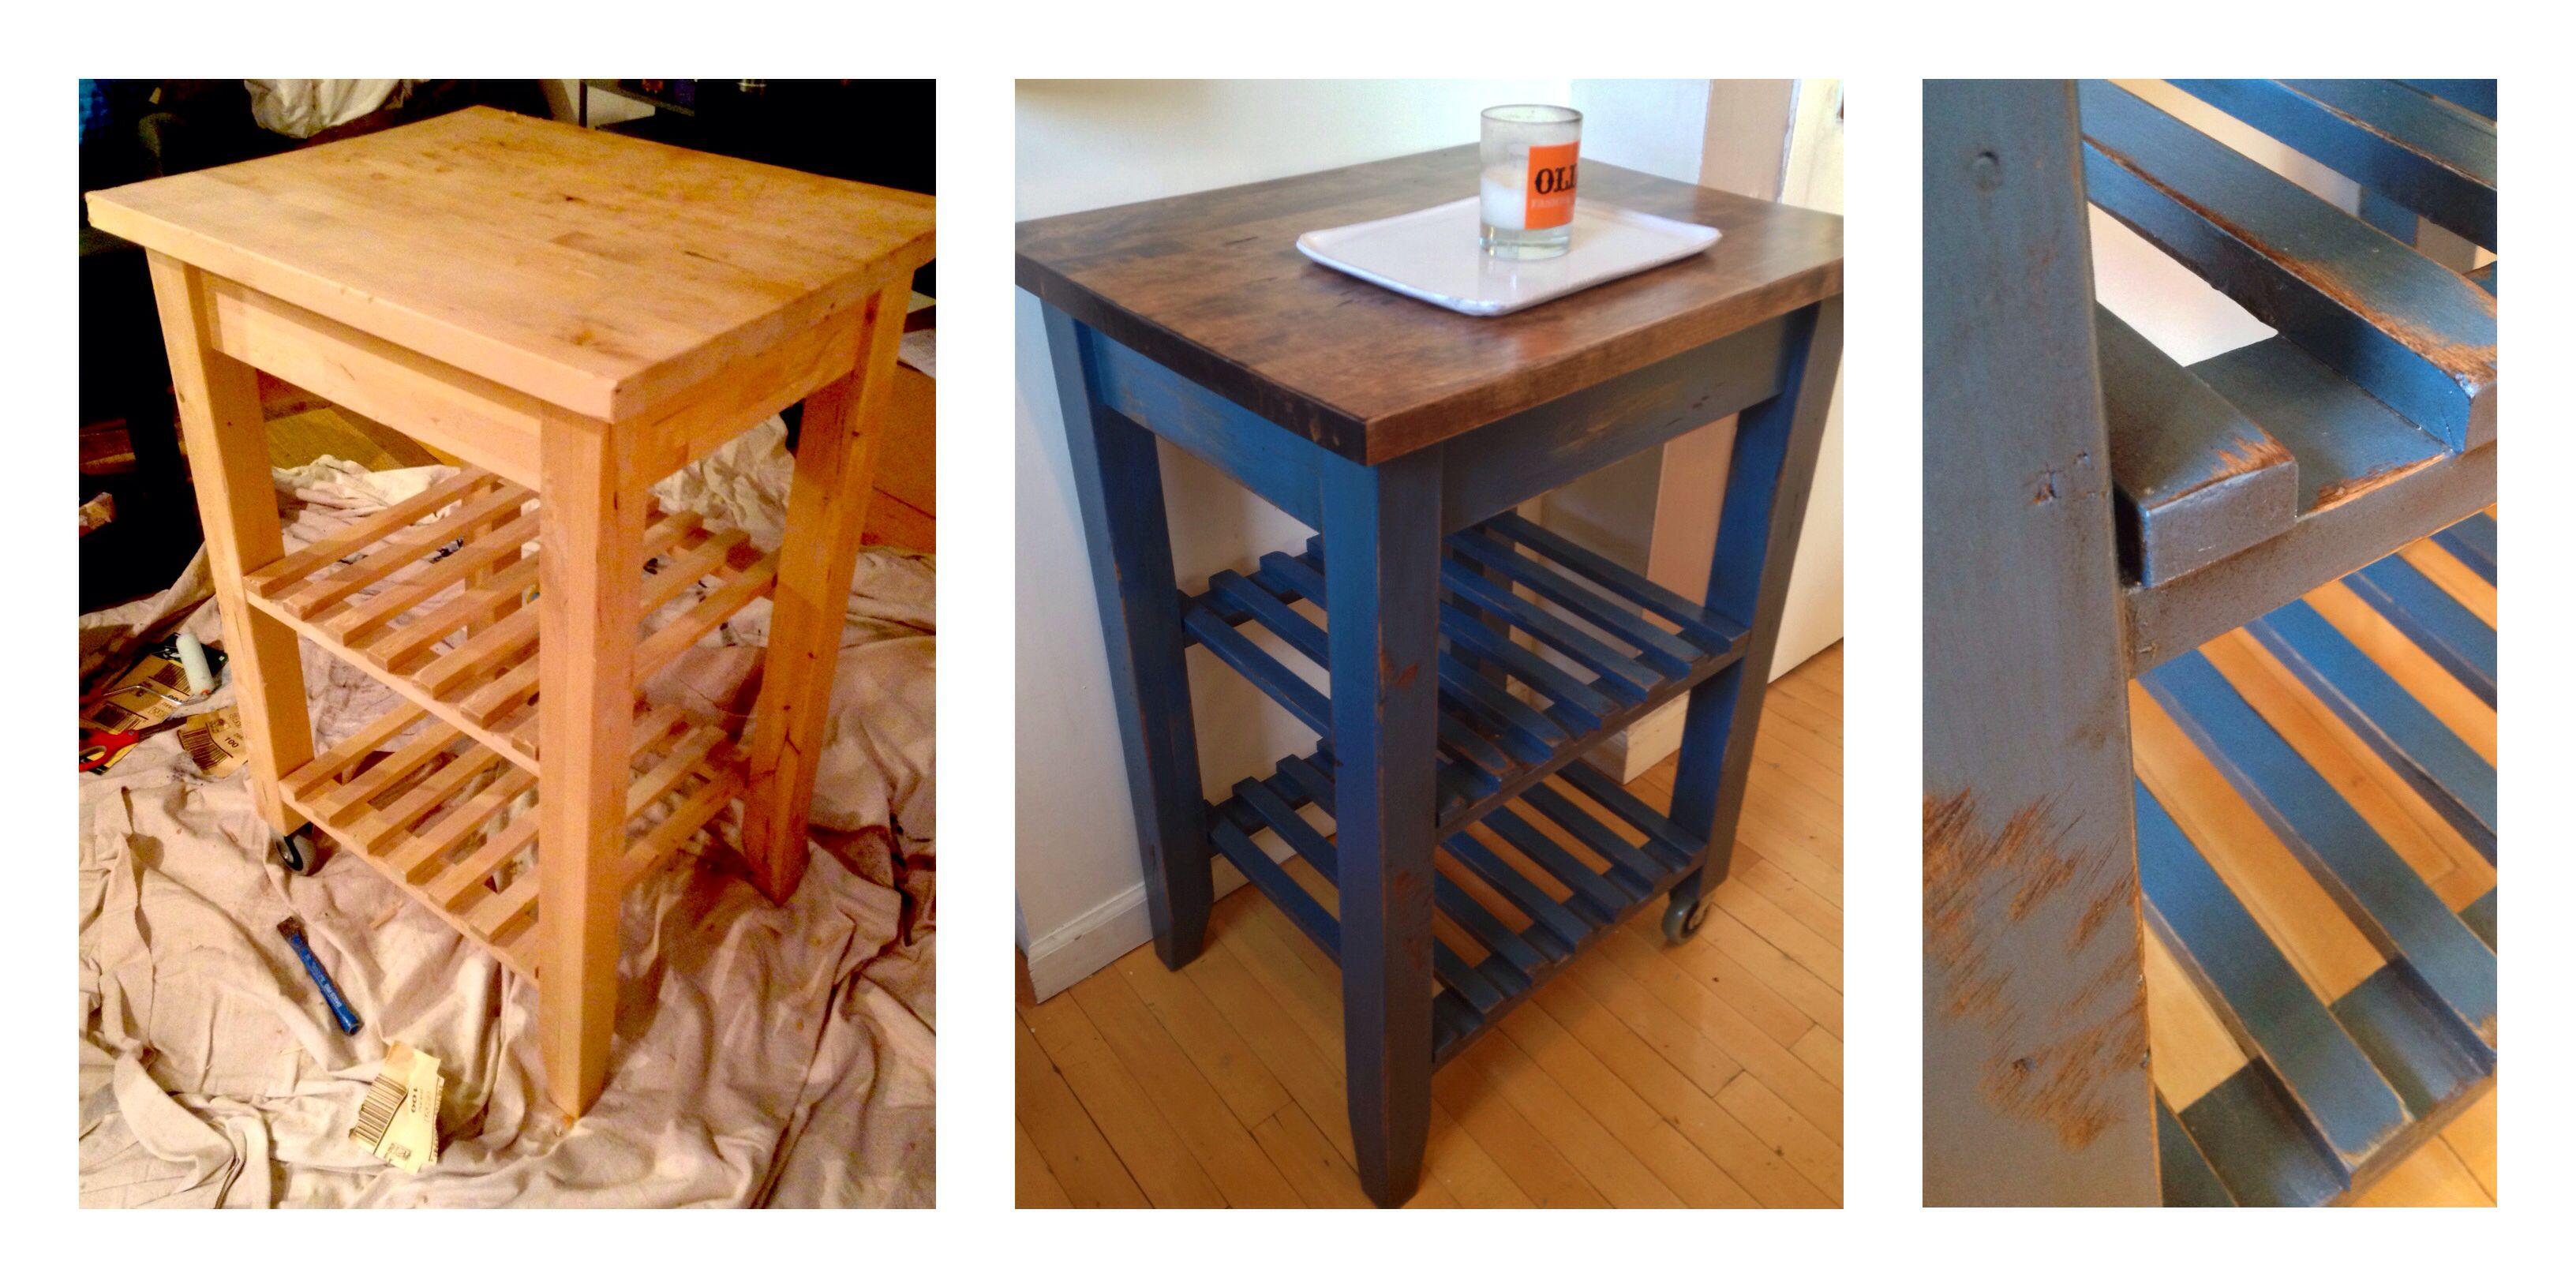 Bekvam kitchen cart Marble Top Gave My Plain Old Ikea BekvÄm Kitchen Cart Makeoverjust Little Sanding Painting Staining And Polyurethane And Bam Pinterest Gave My Plain Old Ikea BekvÄm Kitchen Cart Makeoverjust